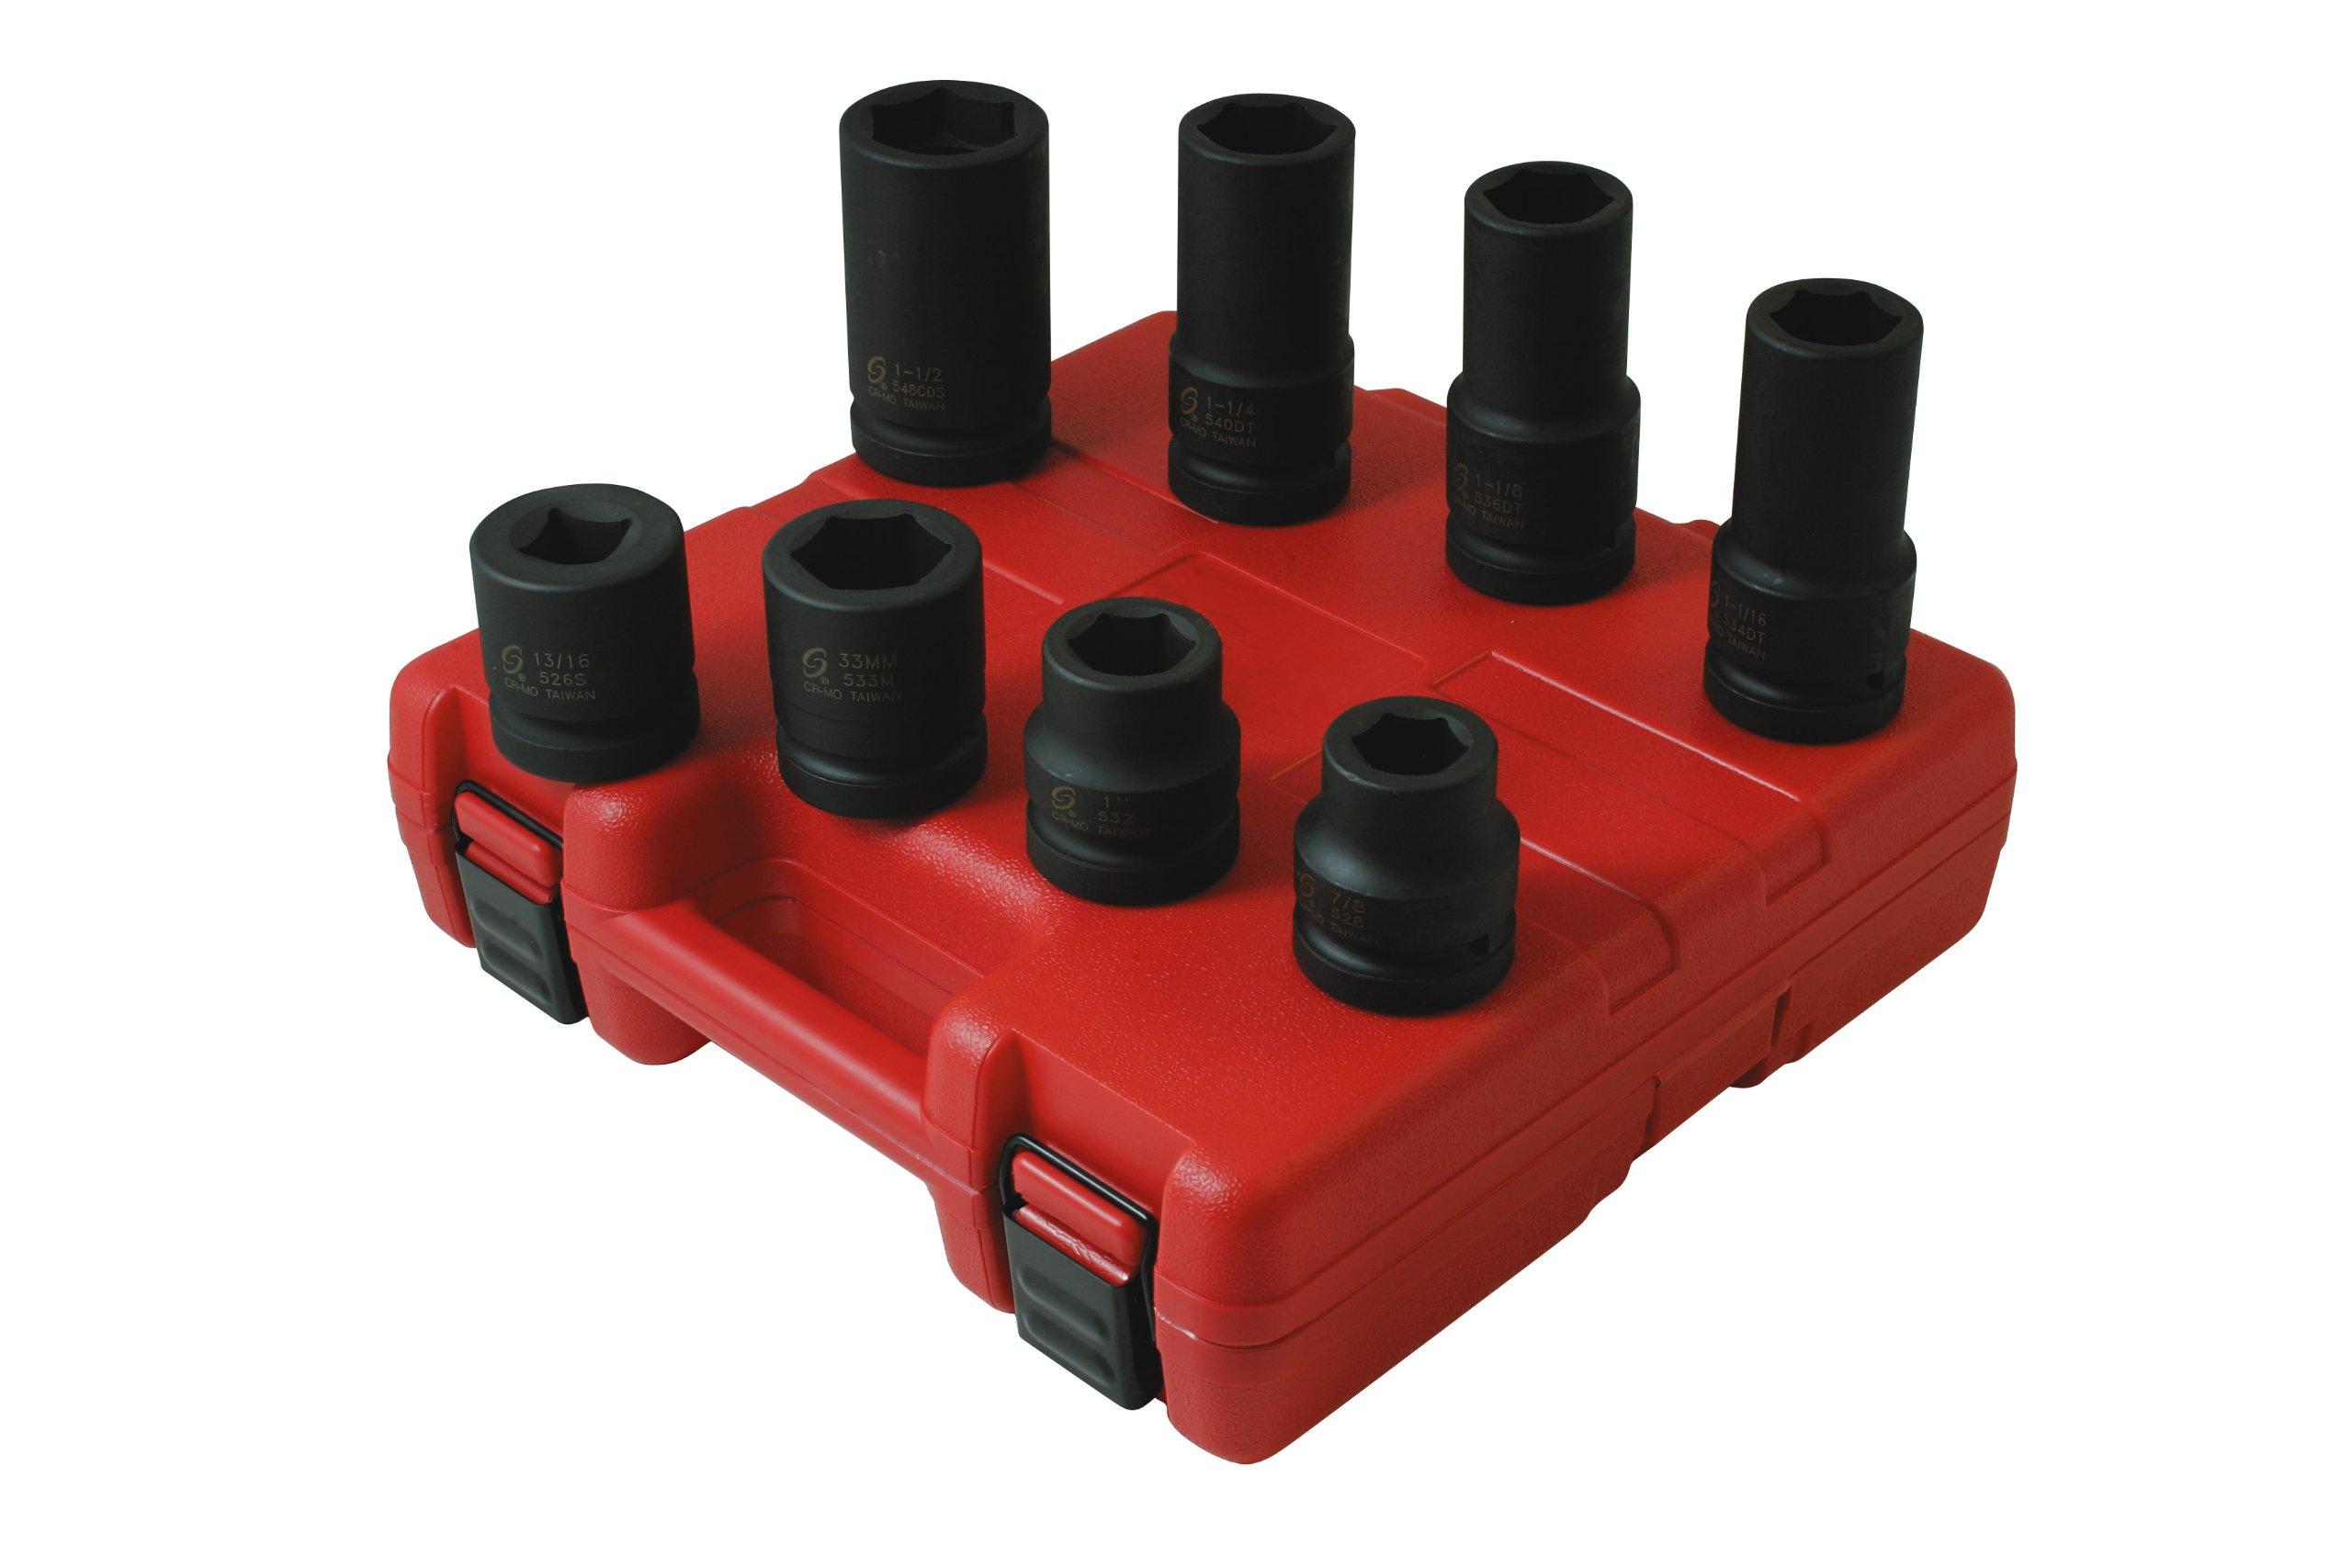 Sunex 5688 1-Inch Drive SAE and Metric Wheel Service Impact Socket Set, 8 piece